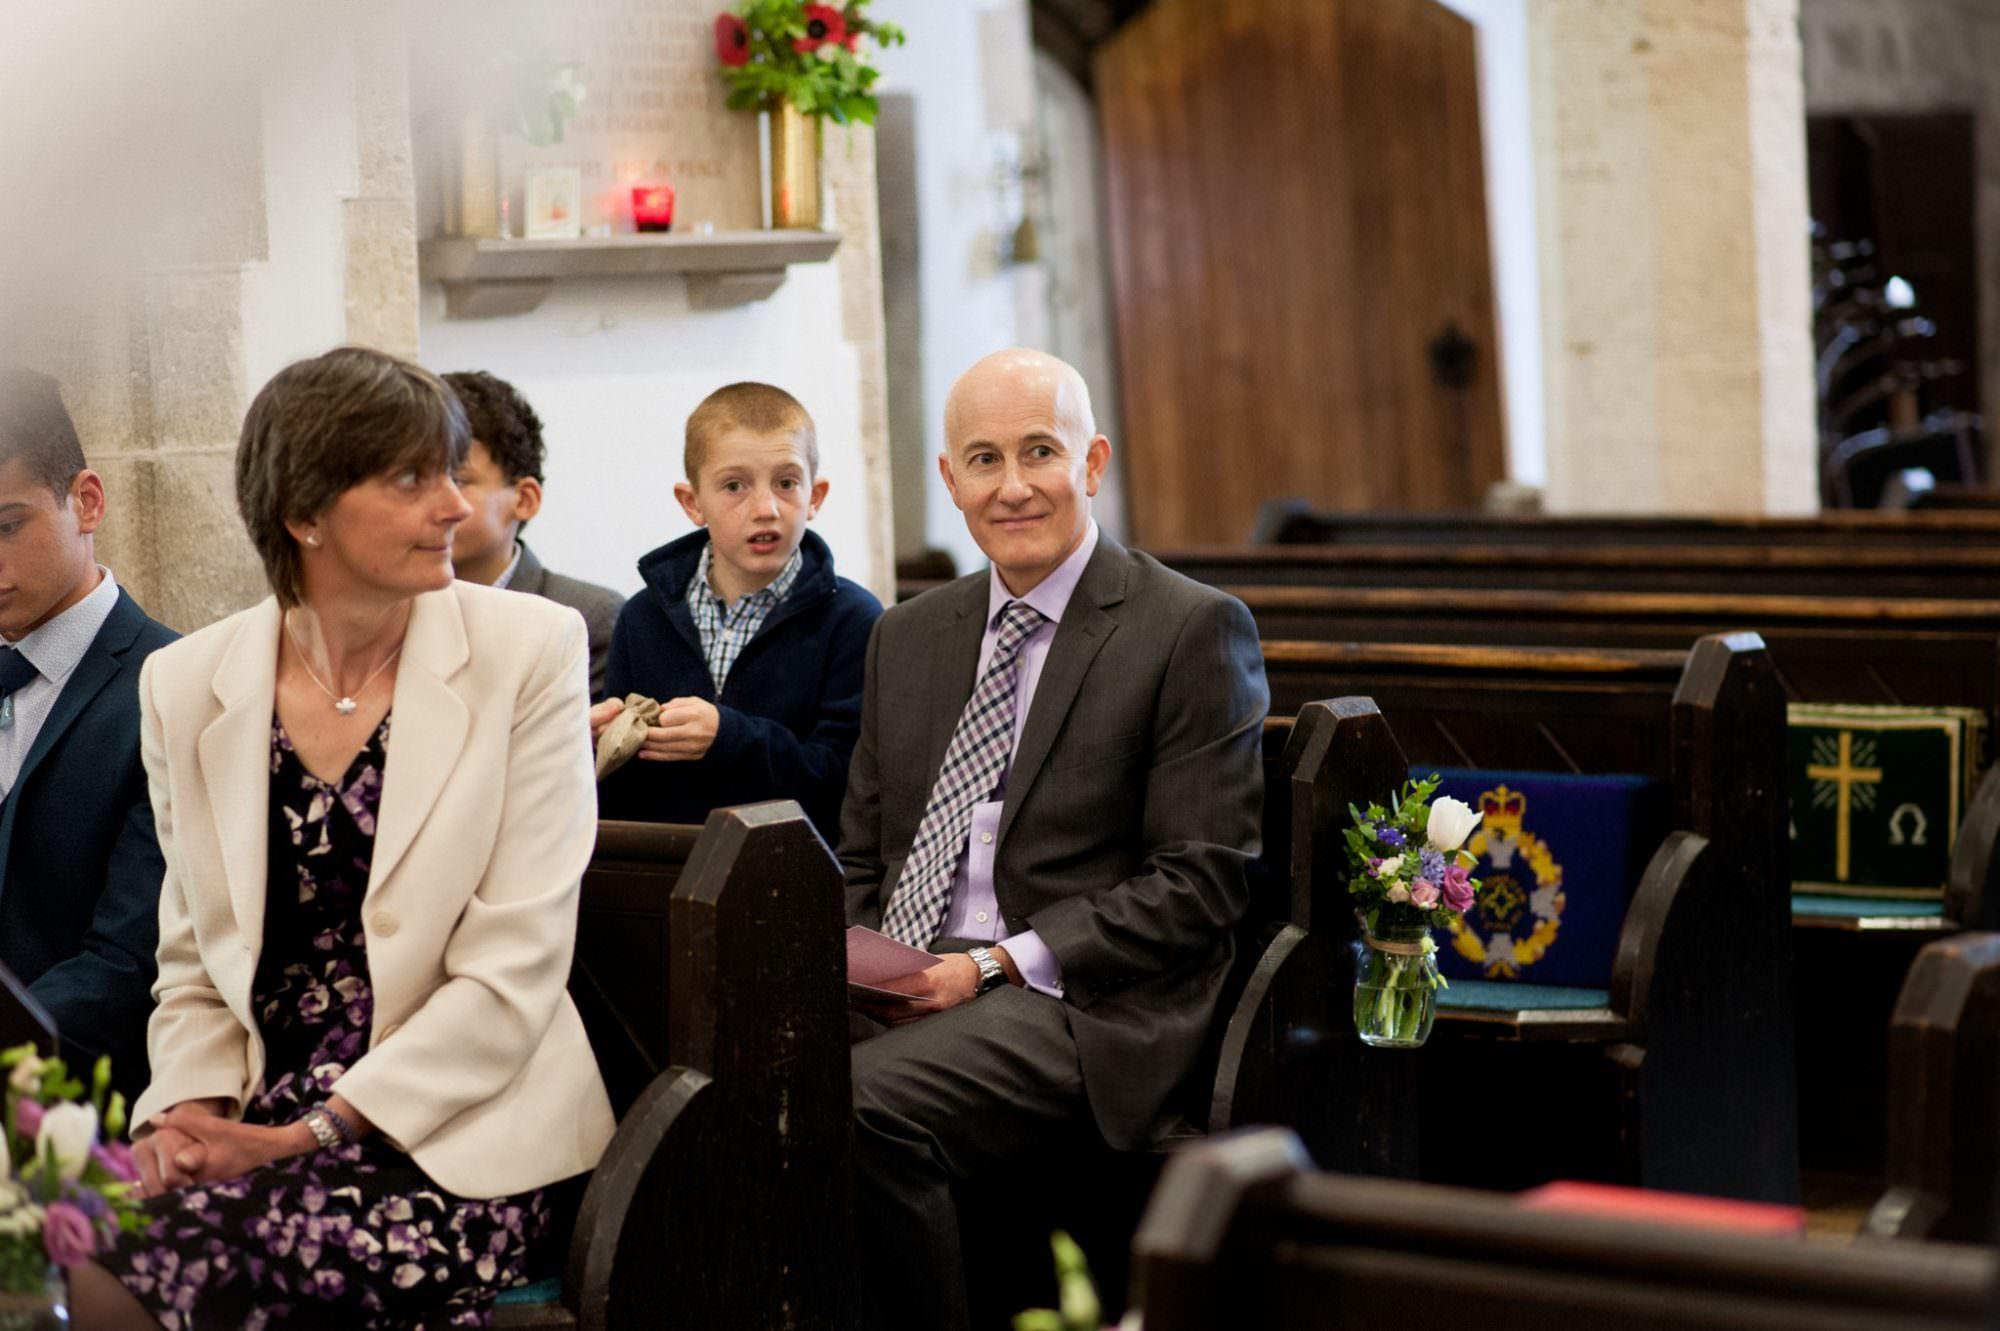 Photograph of Sopley Church Wedding